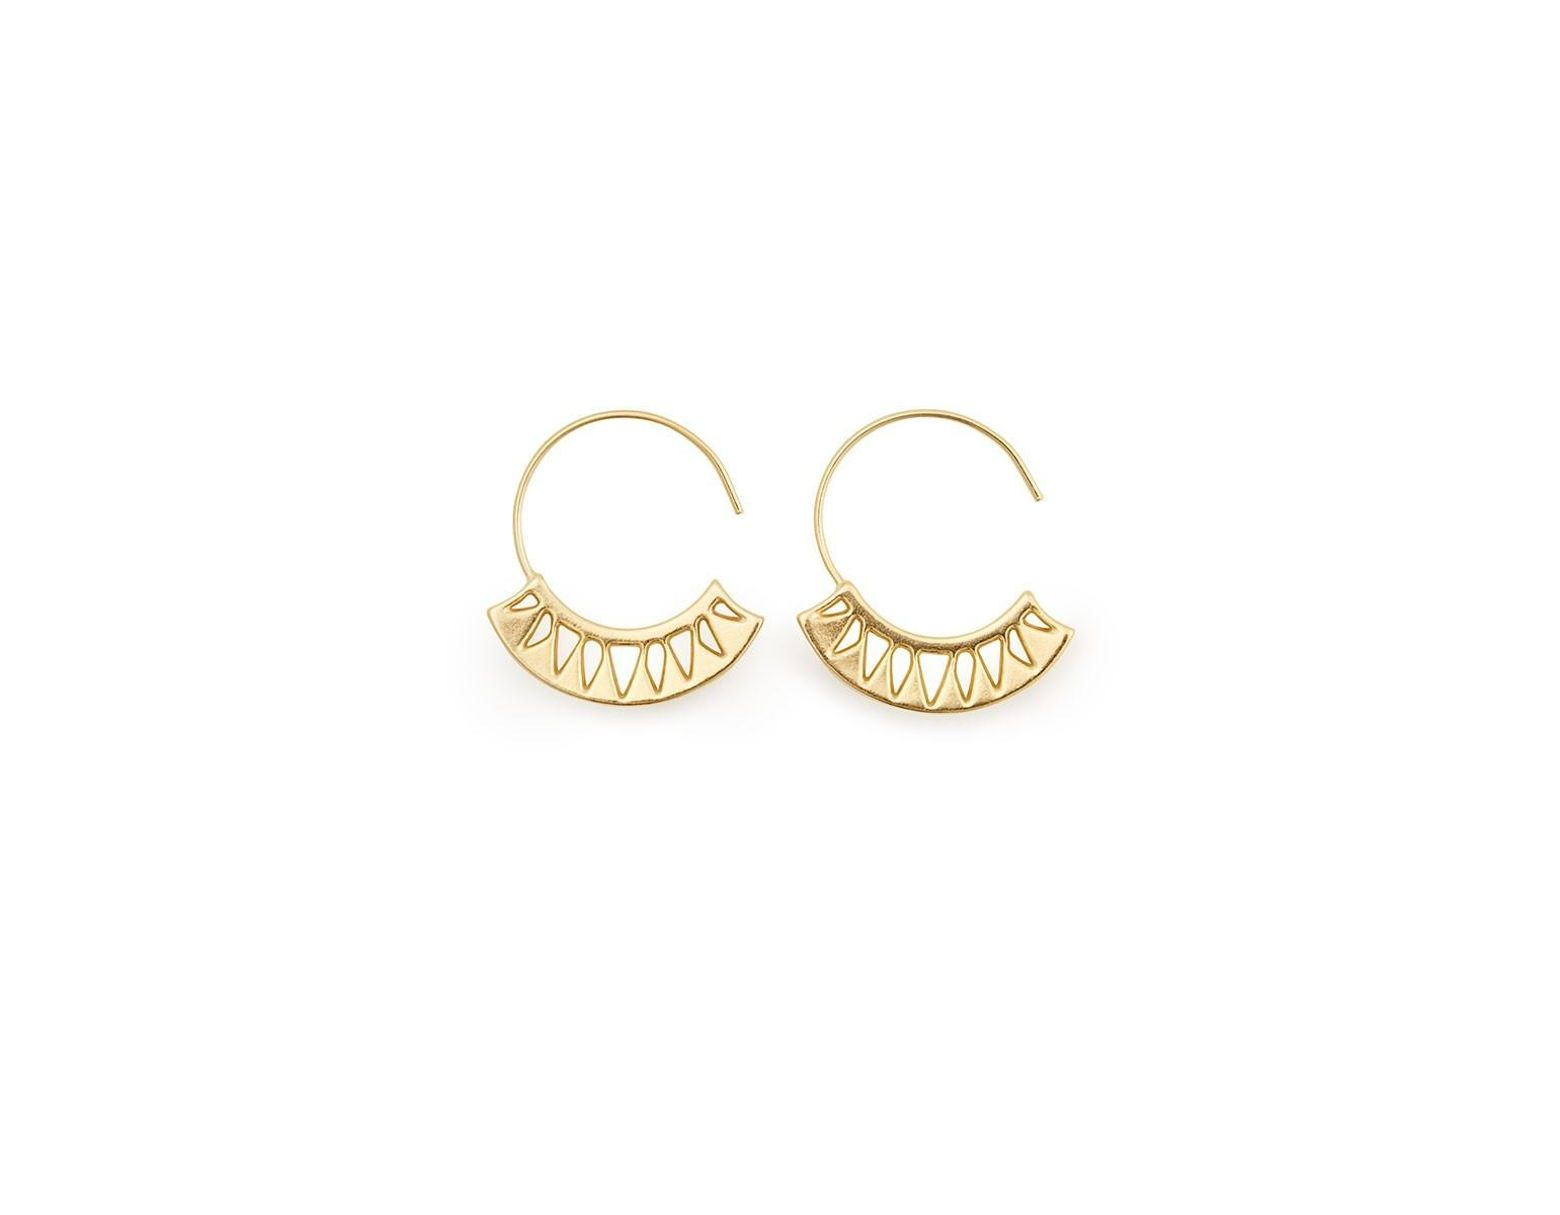 f207f3bdc ALEX AND ANI Blue Lotus Hoop Earrings in Metallic - Save 42% - Lyst